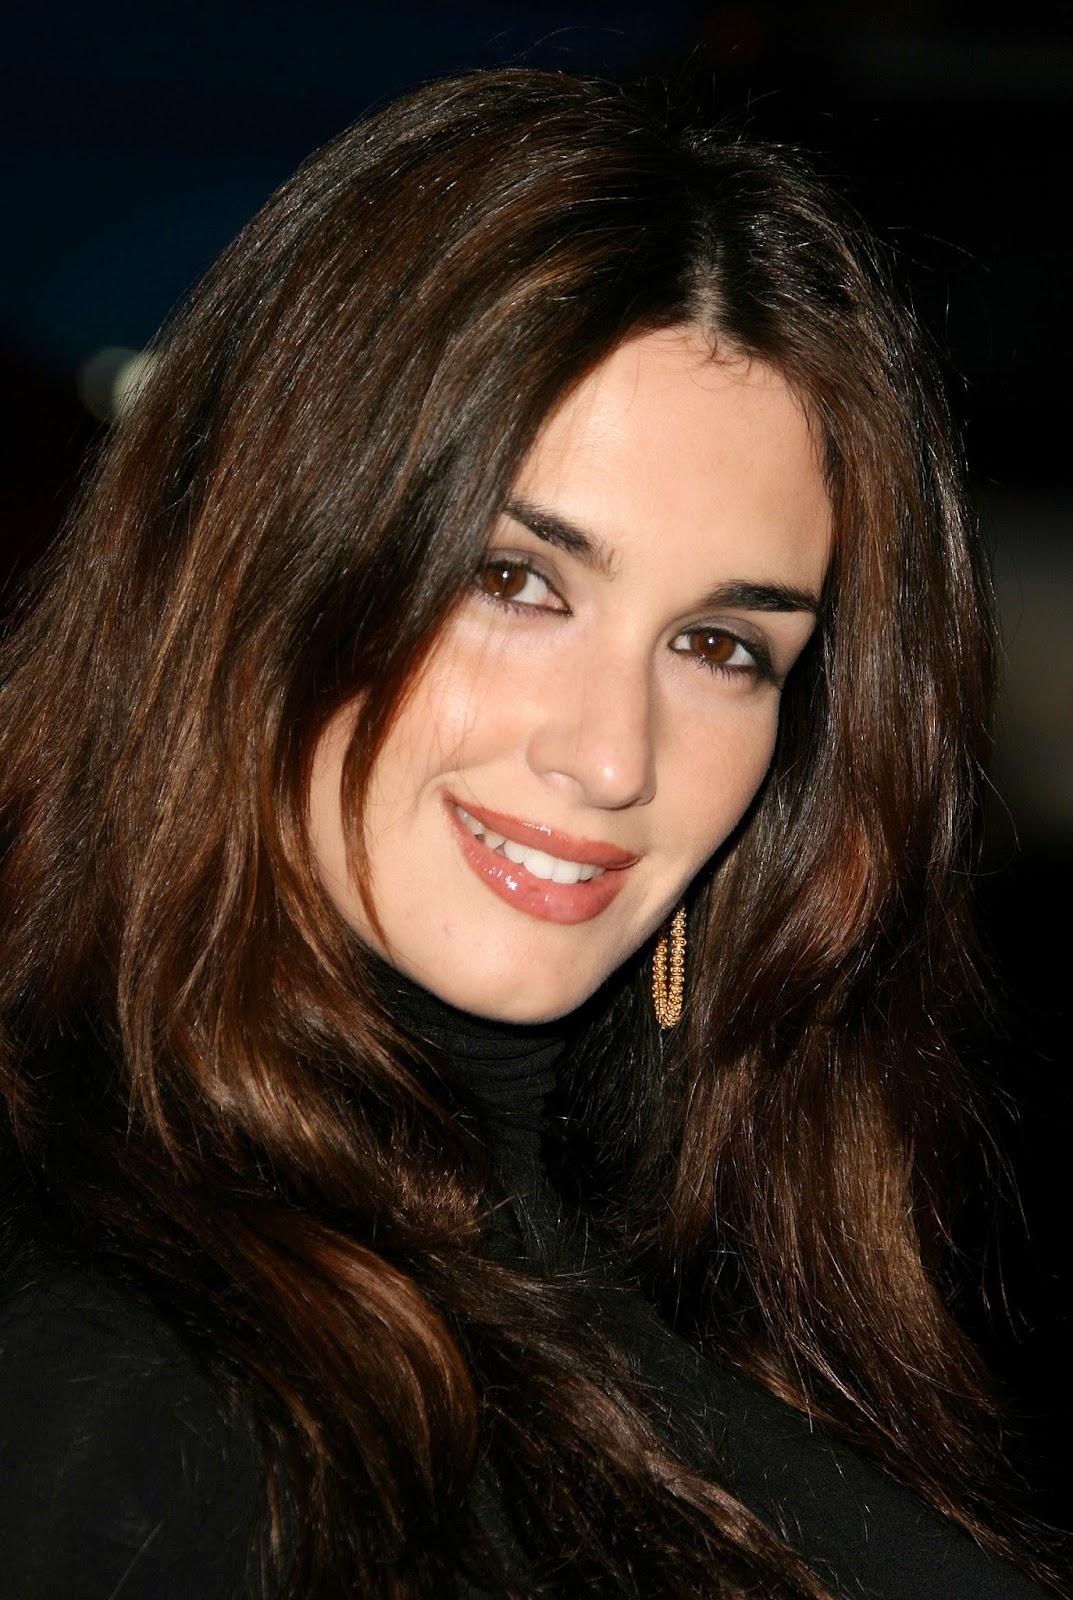 Best Spanish Porn Actress